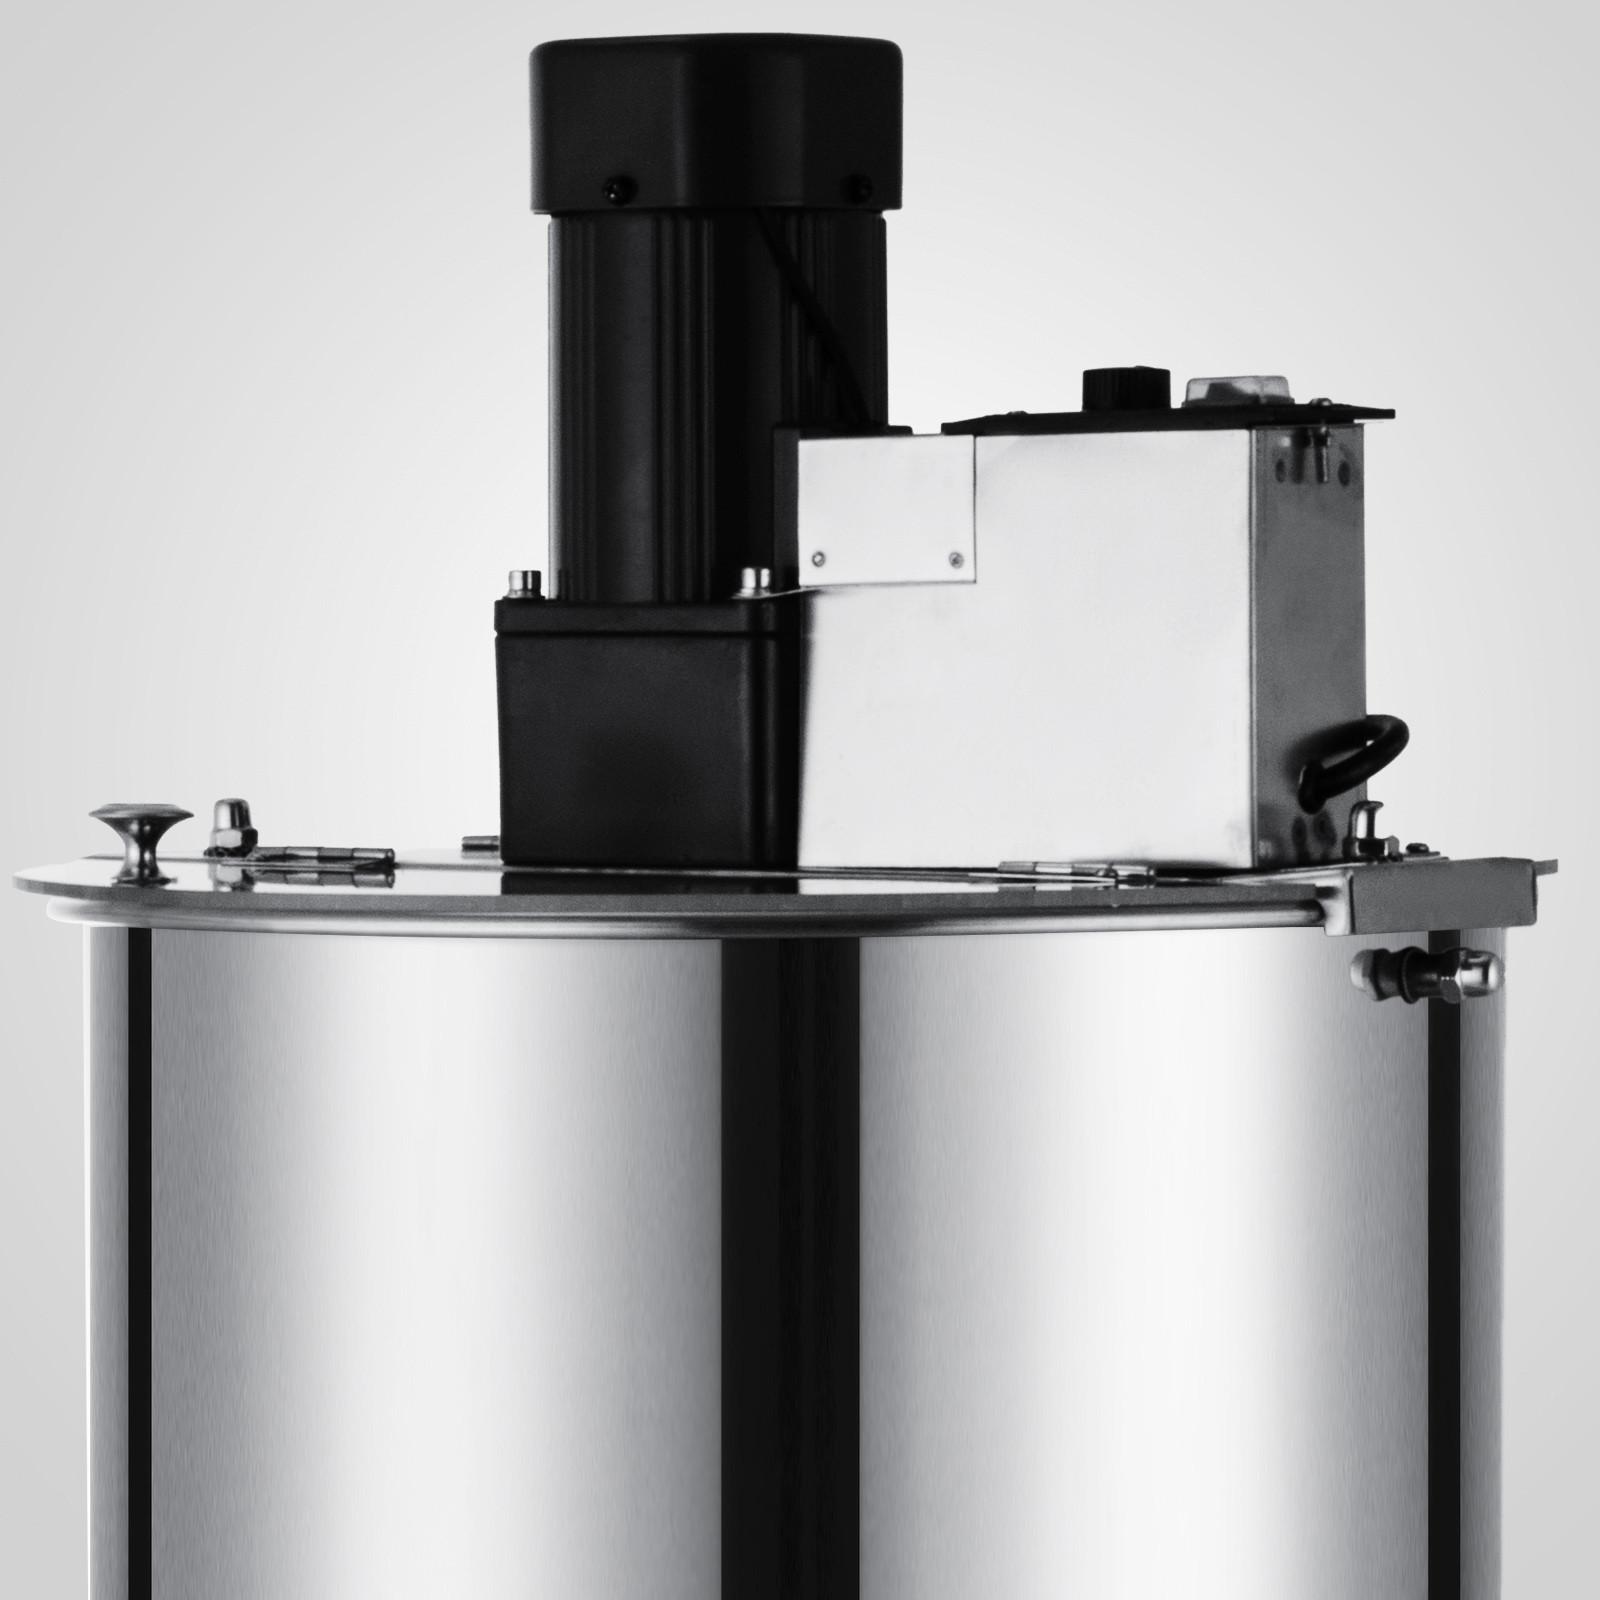 Extracteur-de-Miel-Electrique-manuelle-2-3-4-Cadres-En-Acier-Inox-Centrifugeuse miniature 32